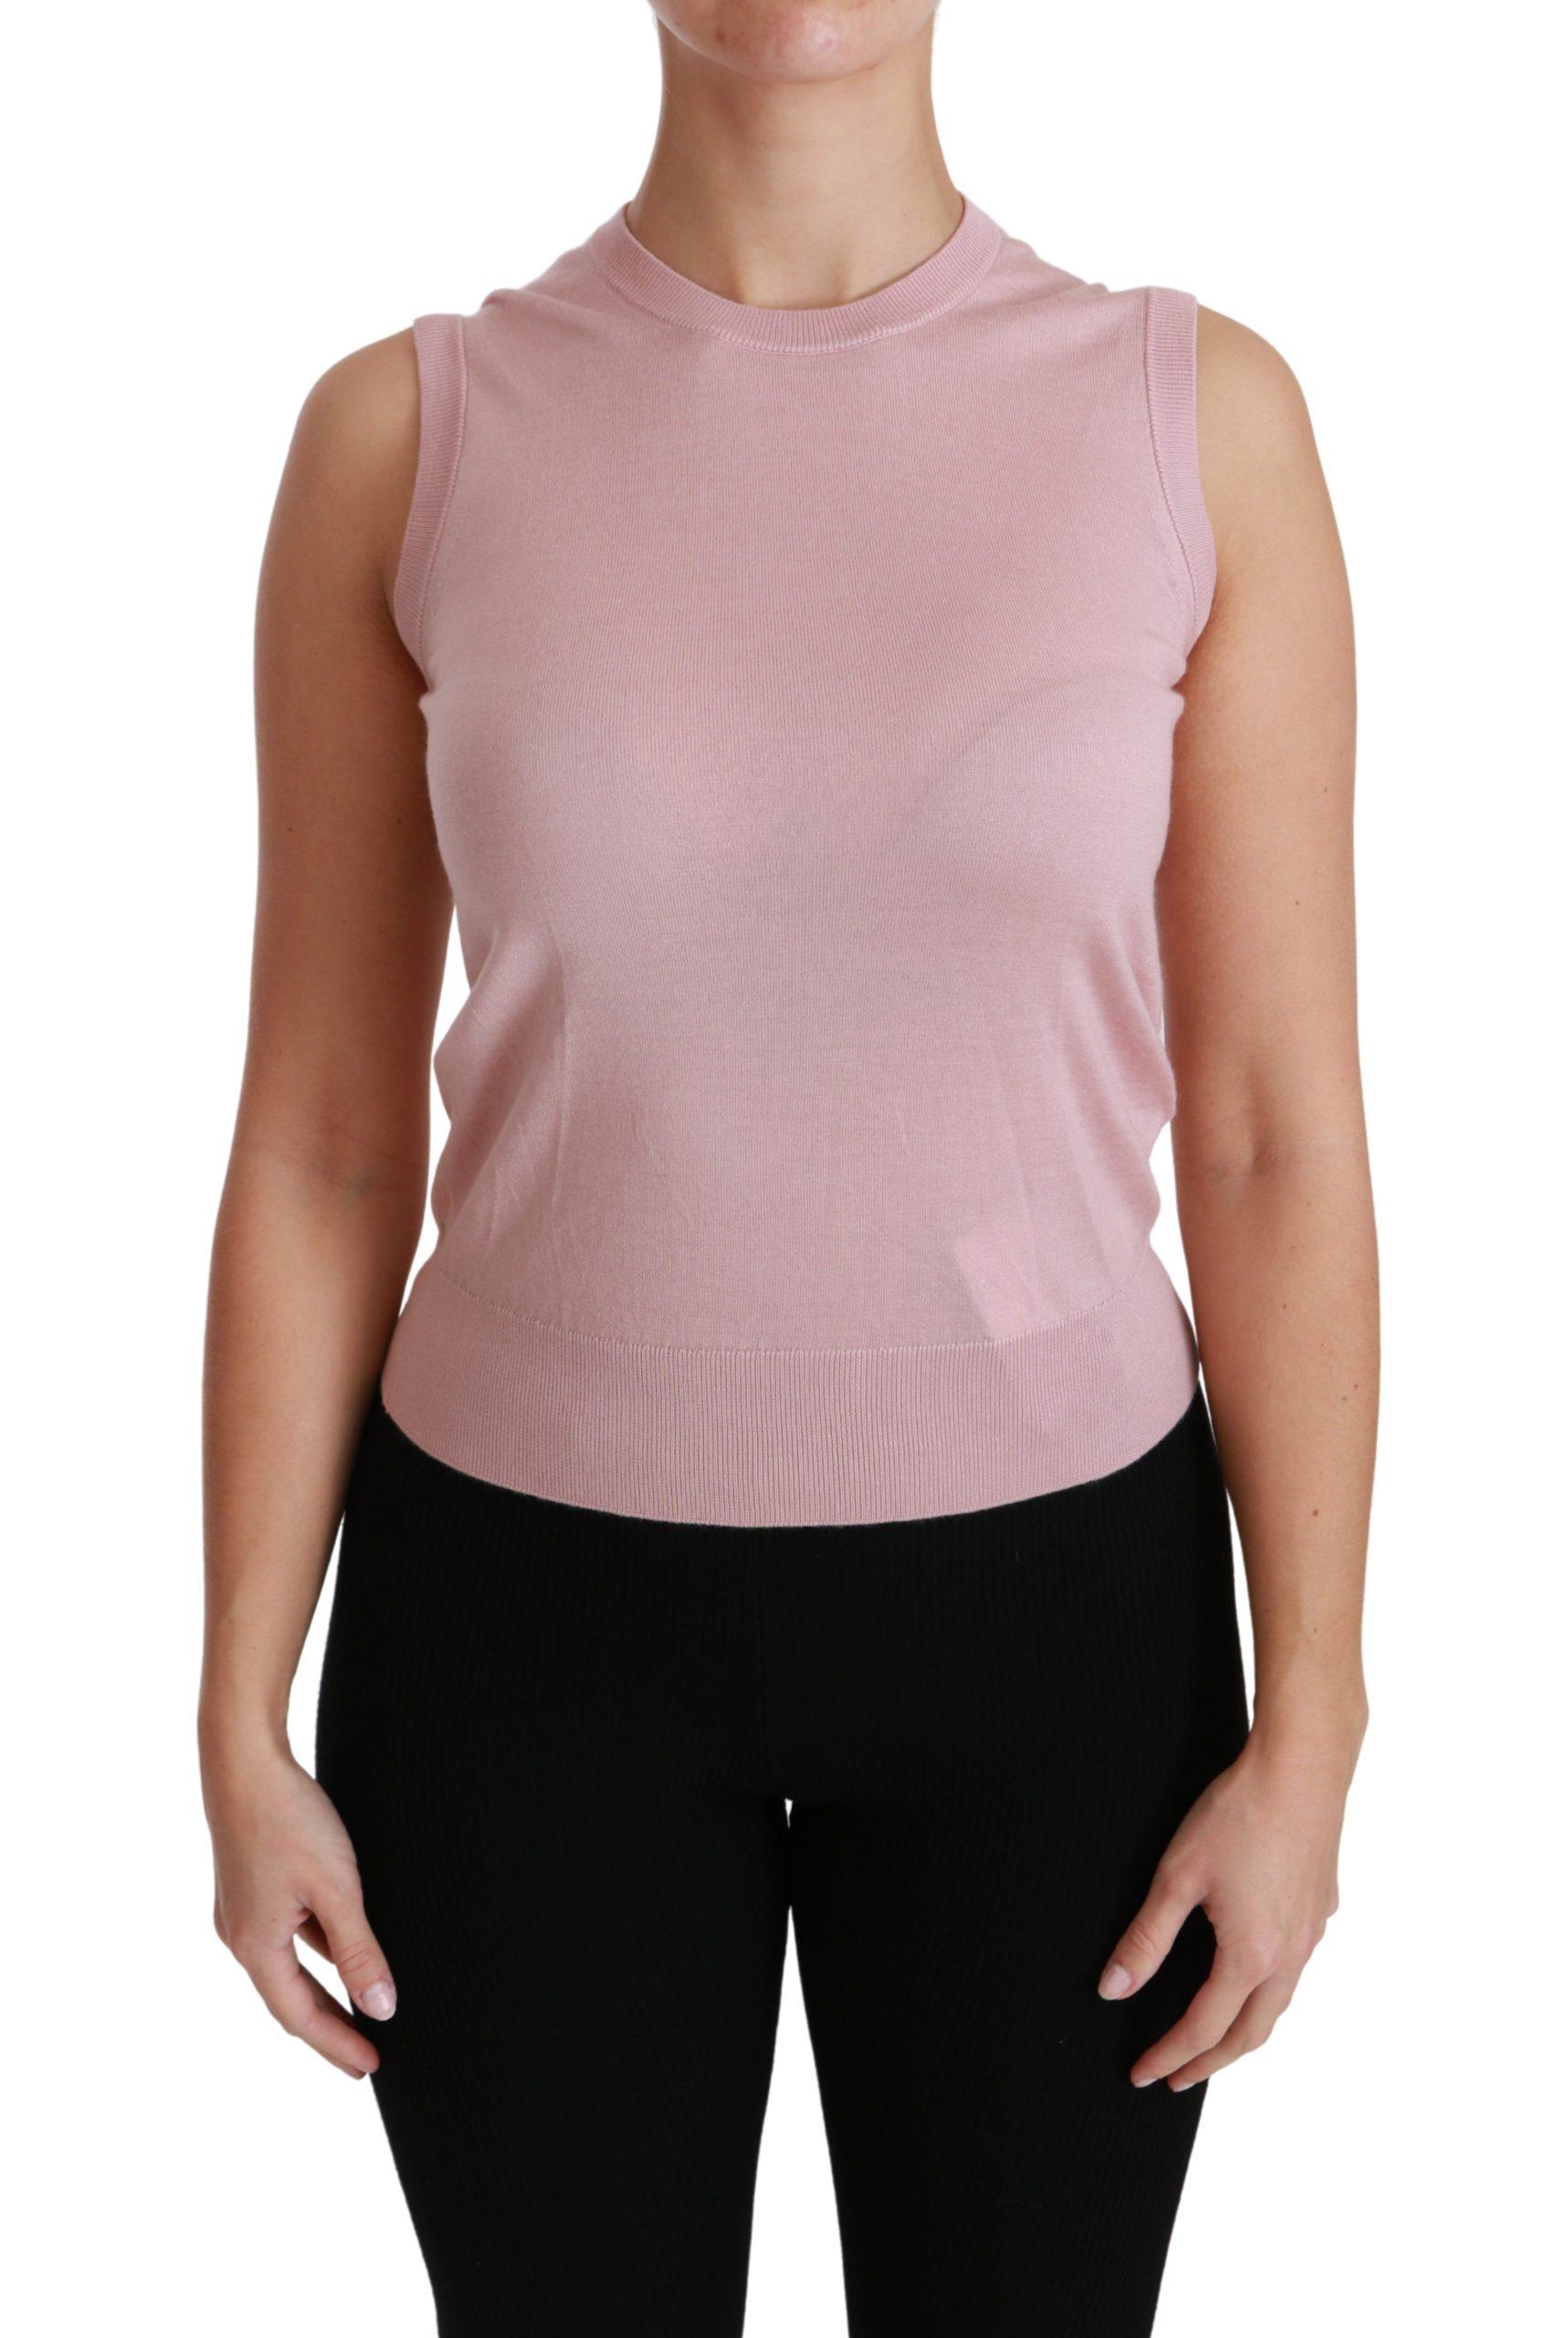 Dolce & Gabbana Women's Cashmere Sleeveless Top Pink TSH4443 - IT38|XS